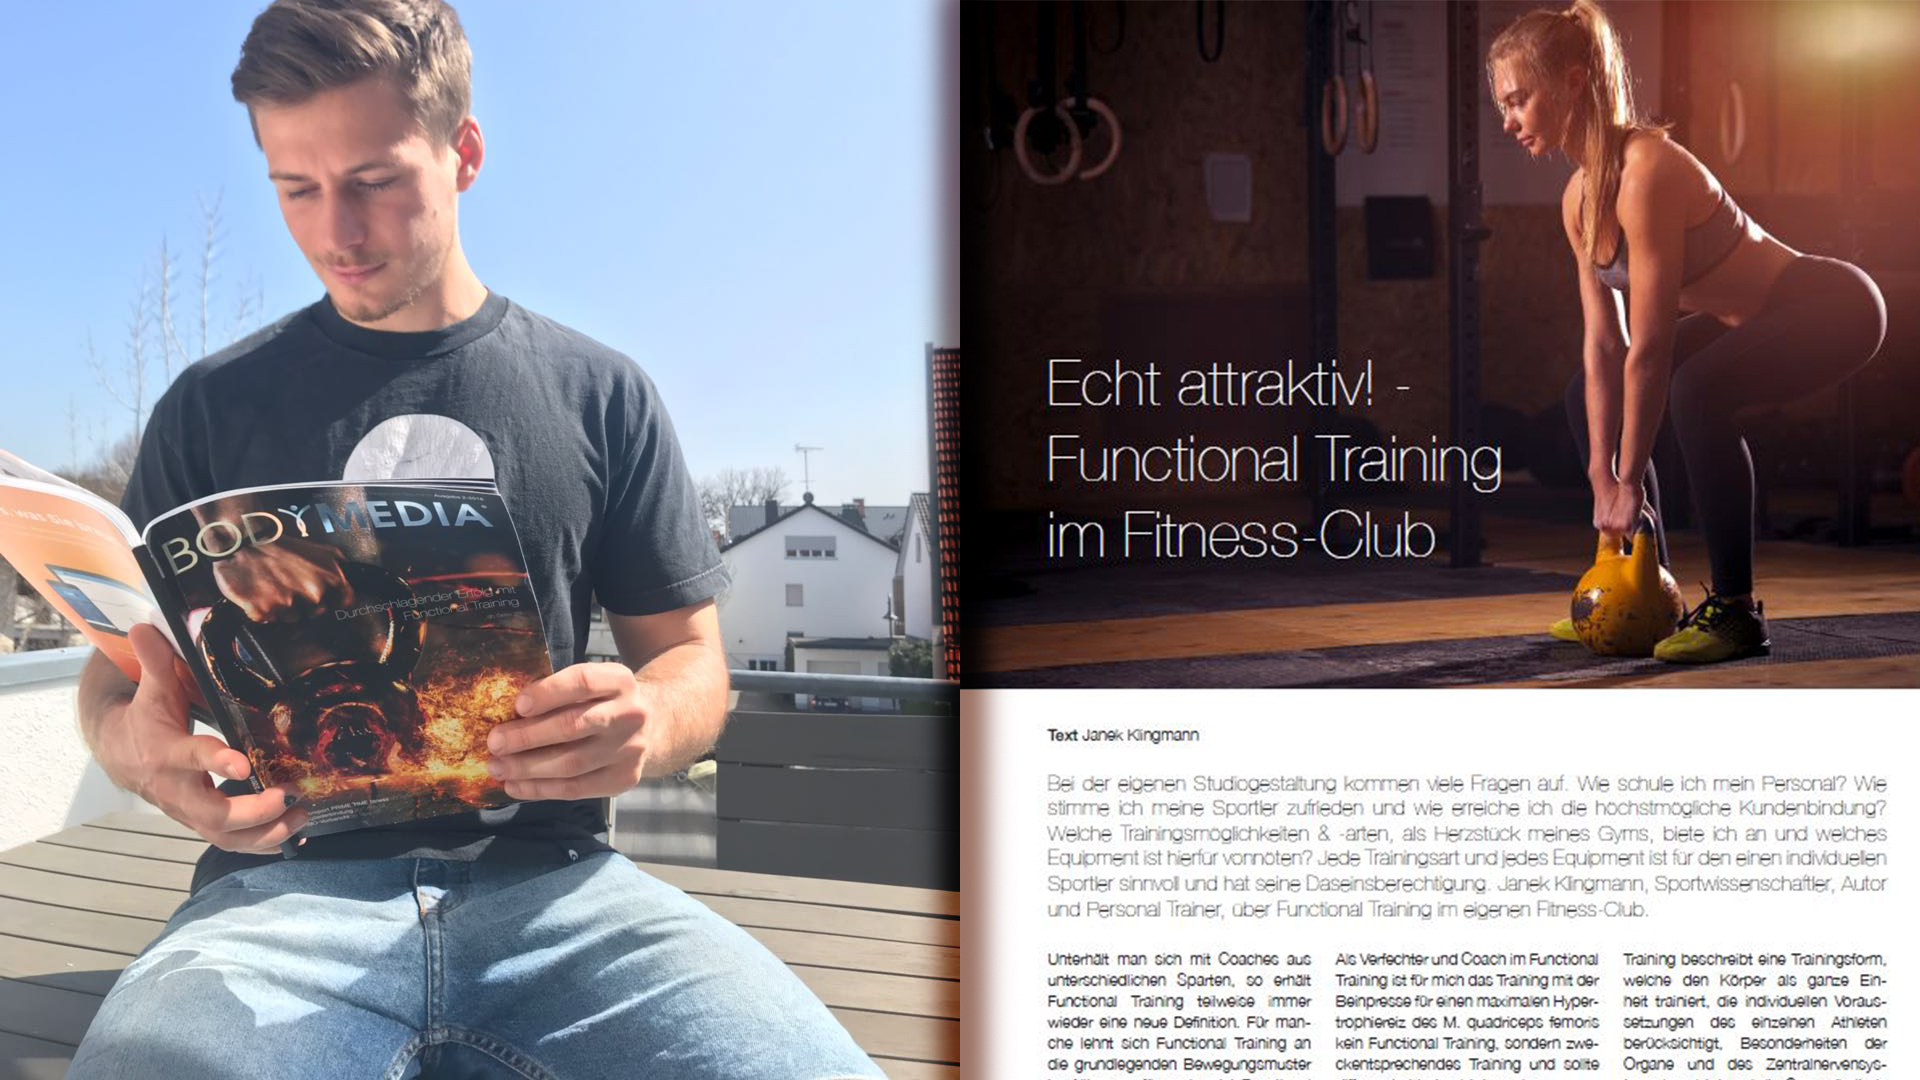 Echt attraktiv! – Functional Training im Fitness-Club